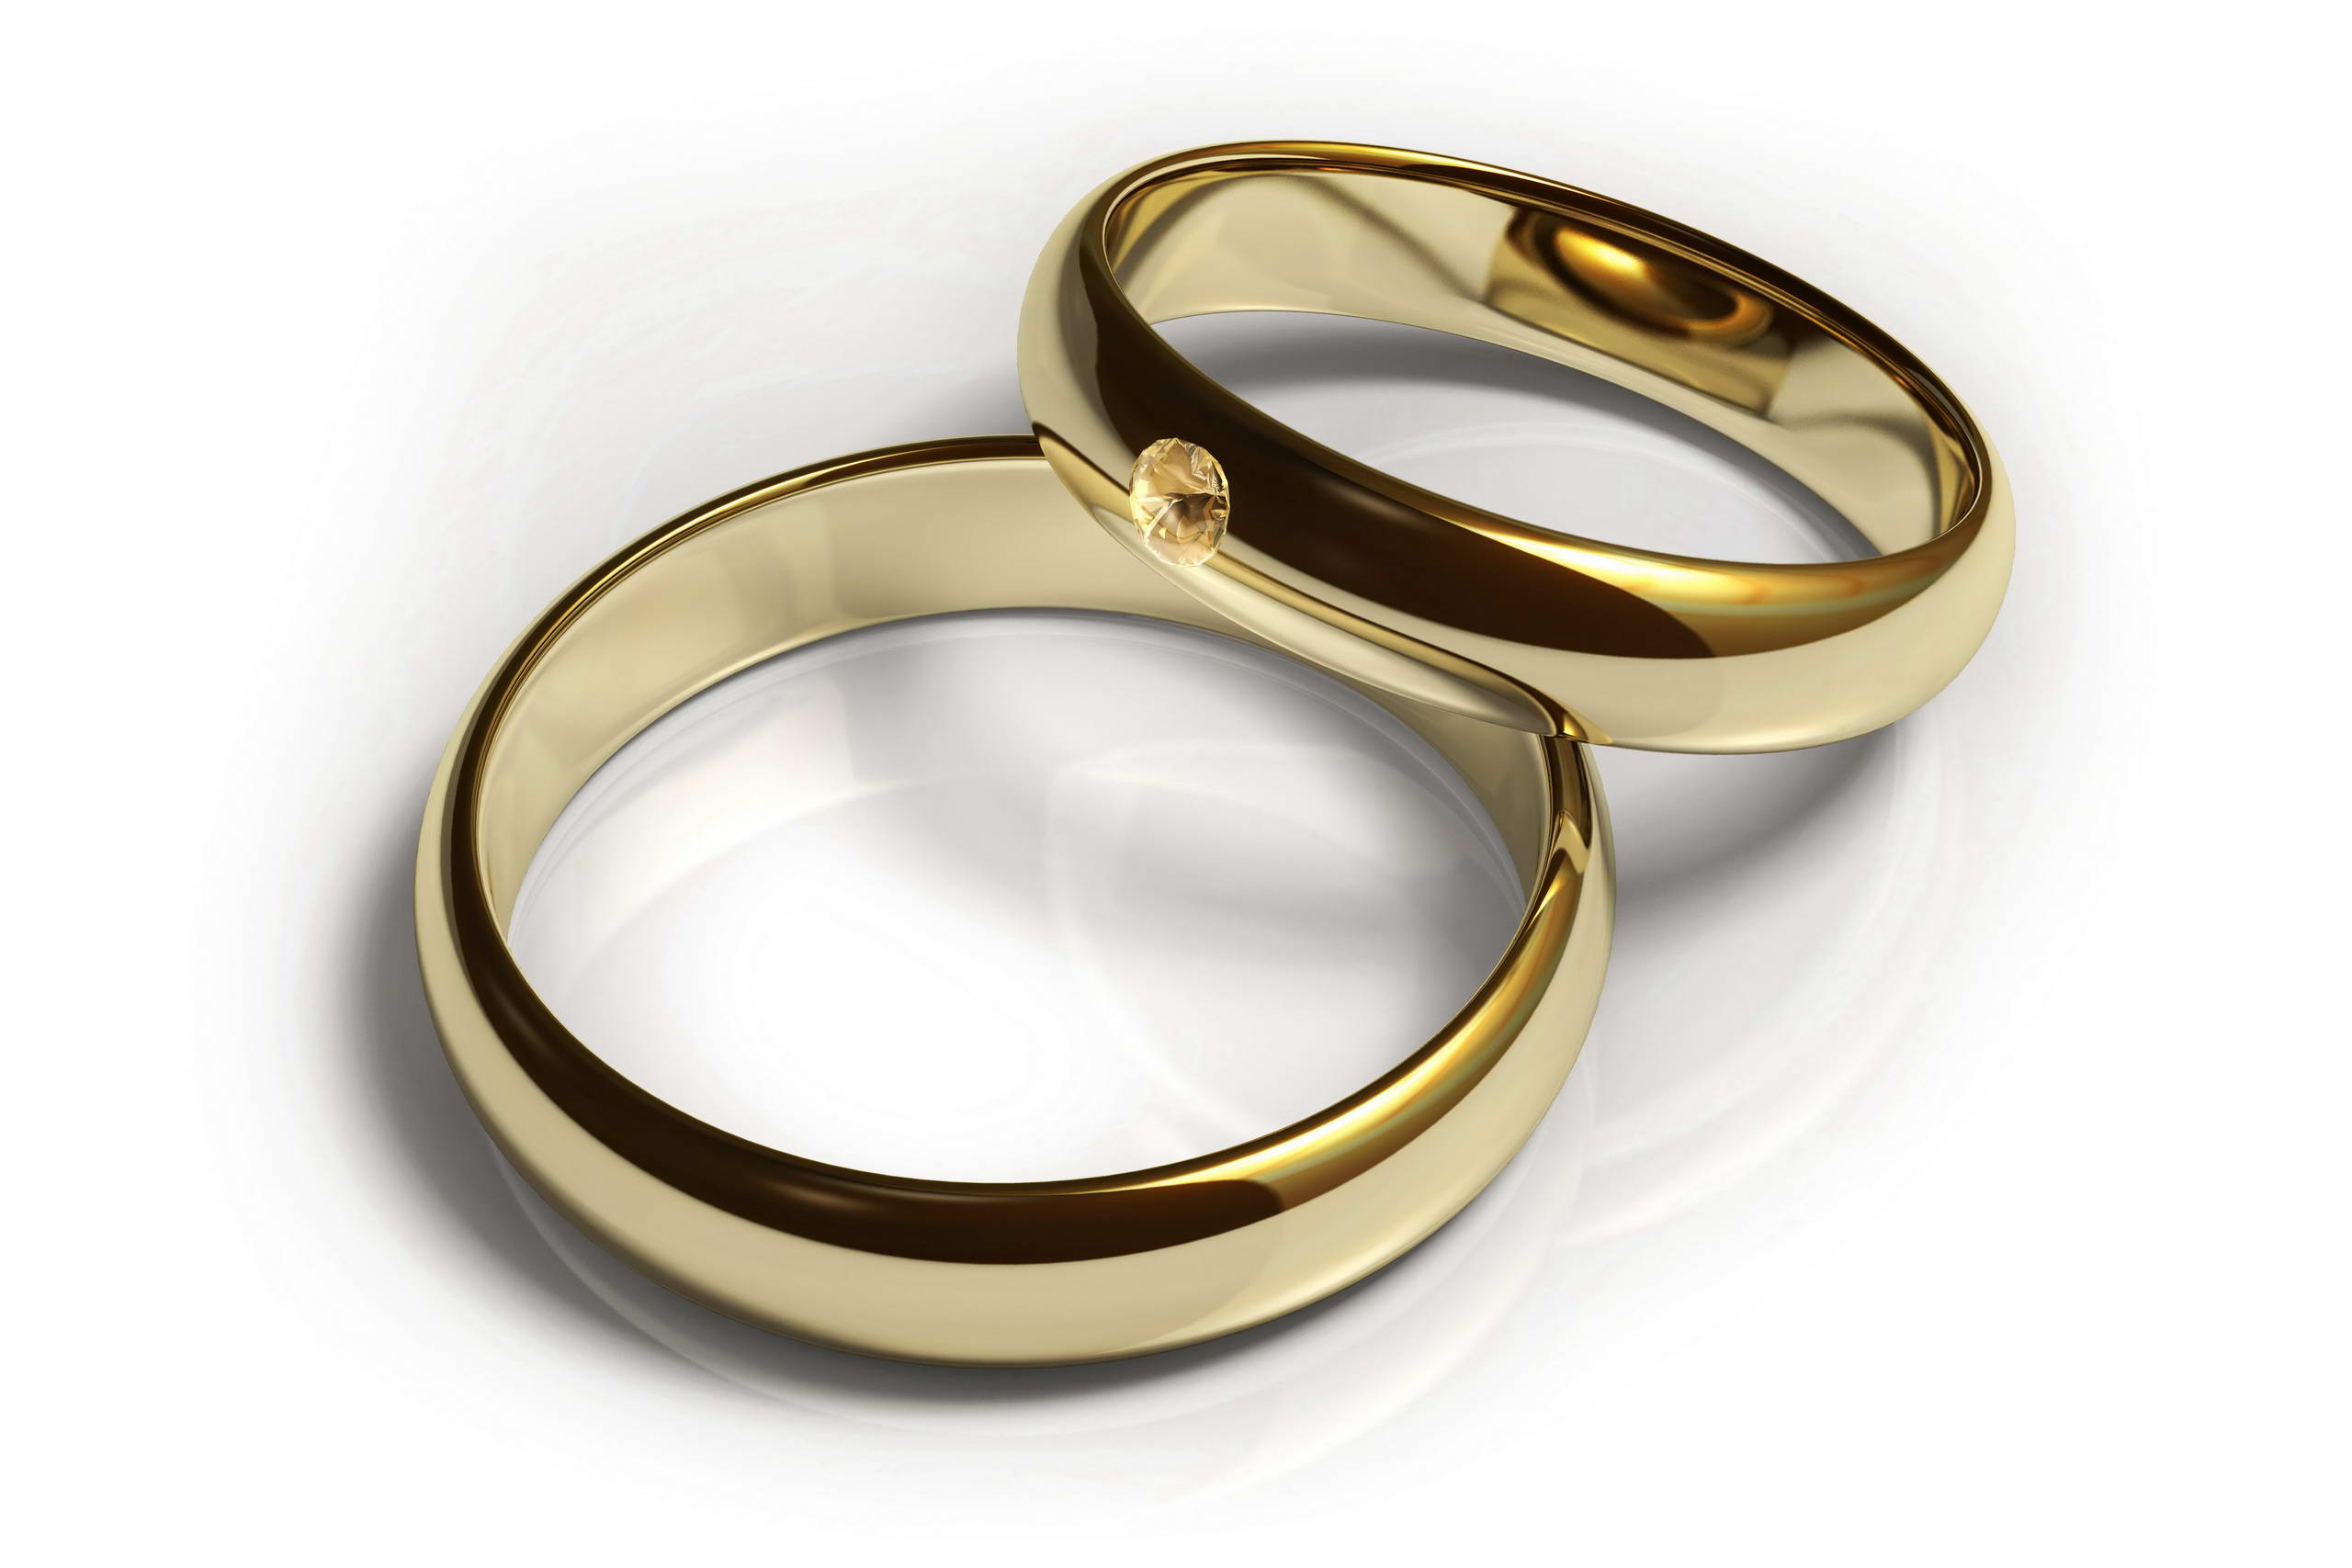 wedding rings wedding rings wedding Bands